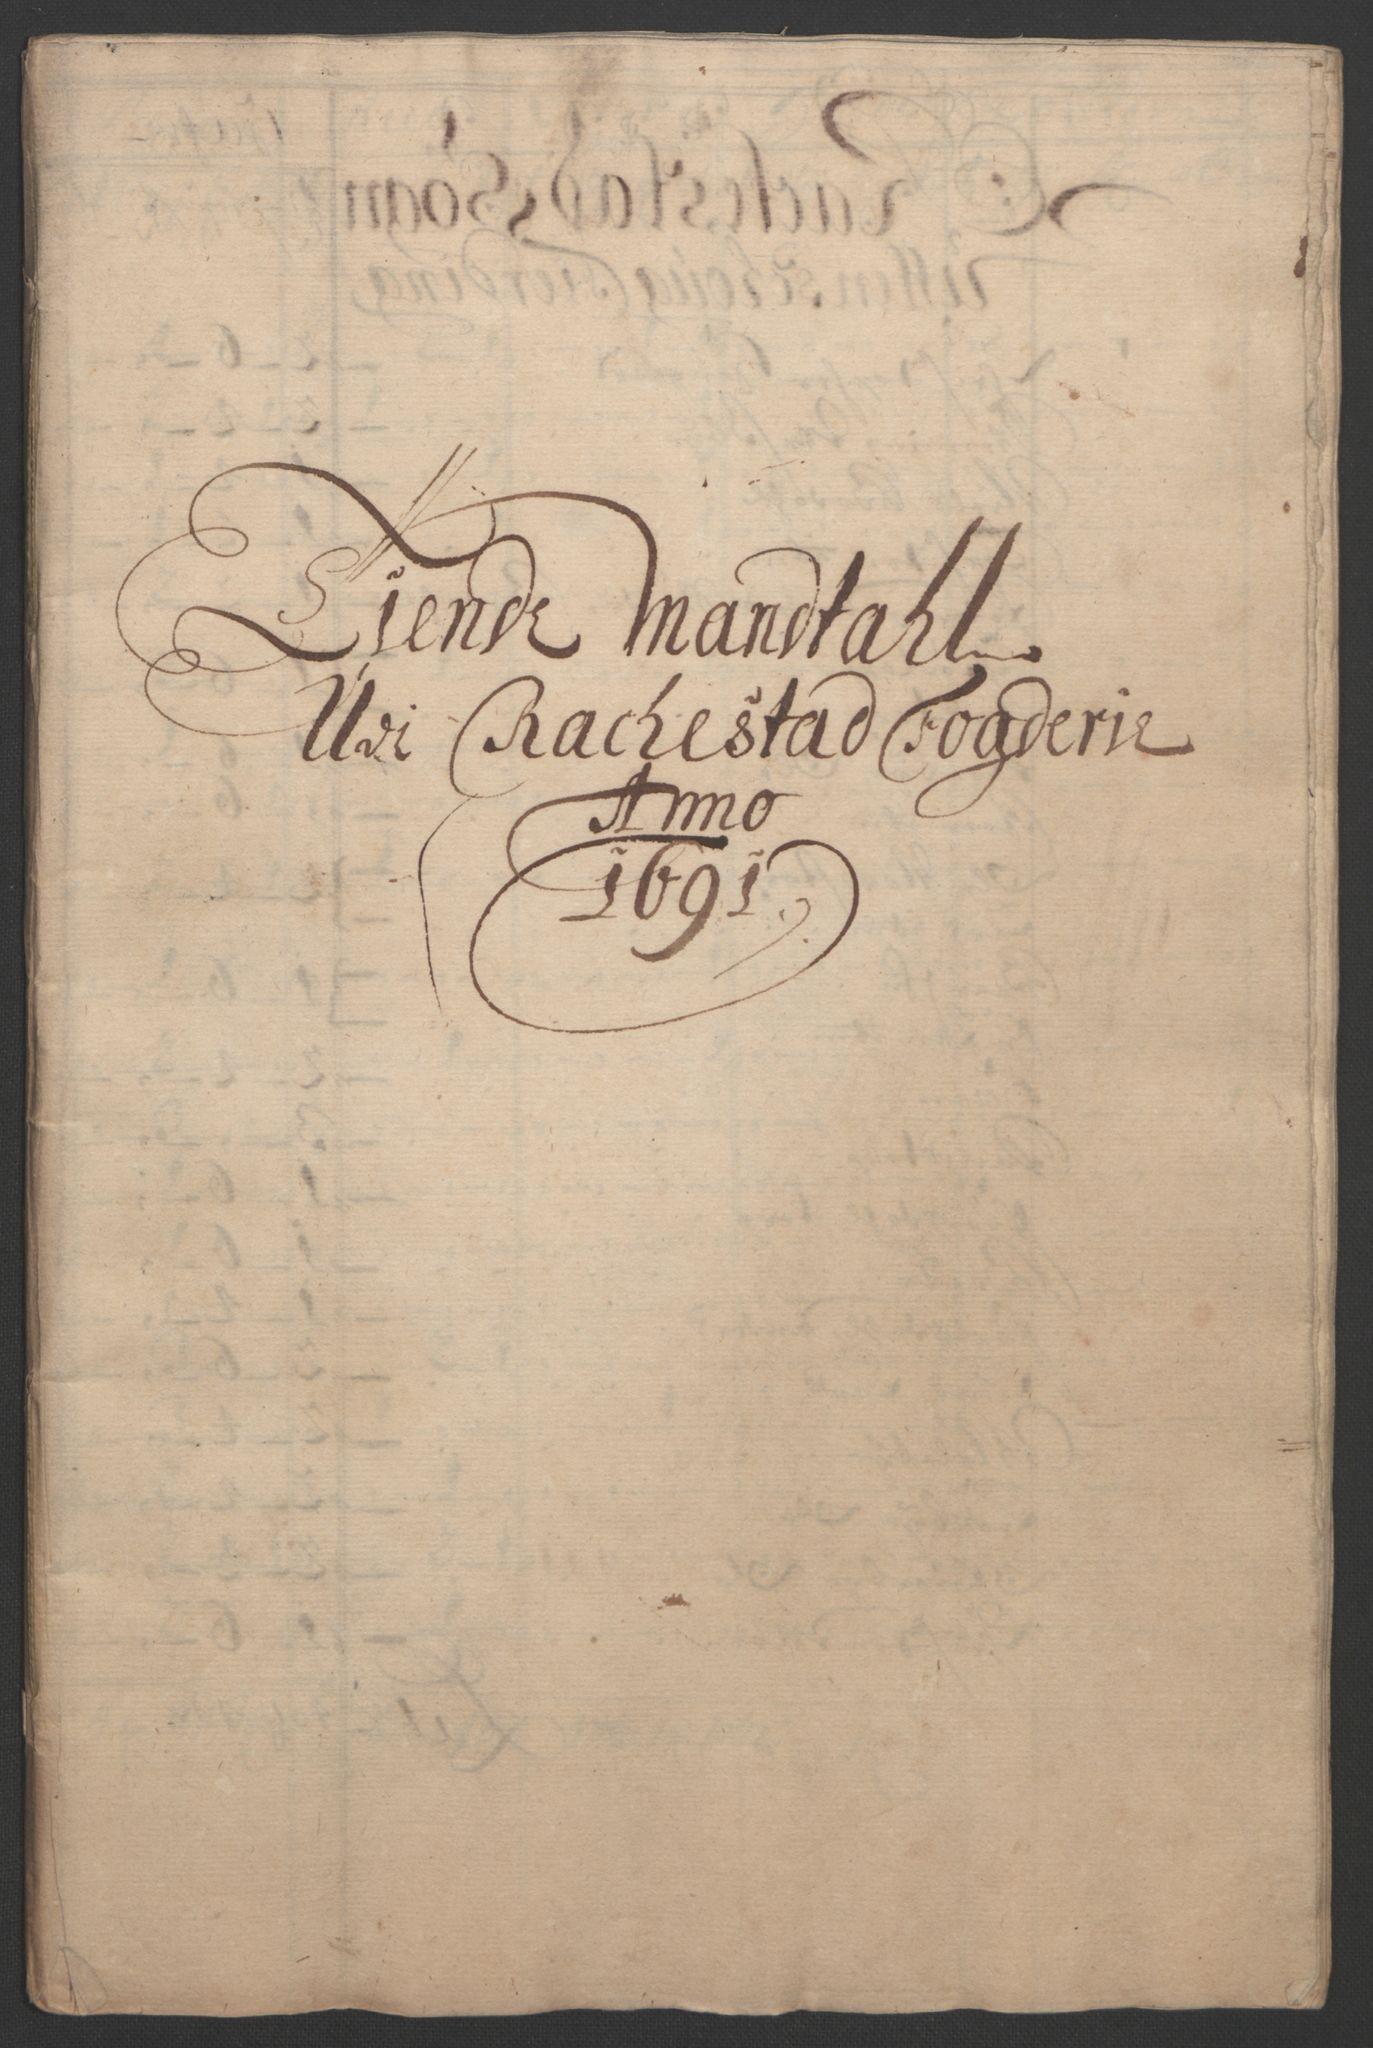 RA, Rentekammeret inntil 1814, Reviderte regnskaper, Fogderegnskap, R05/L0278: Fogderegnskap Rakkestad, 1691-1693, s. 22